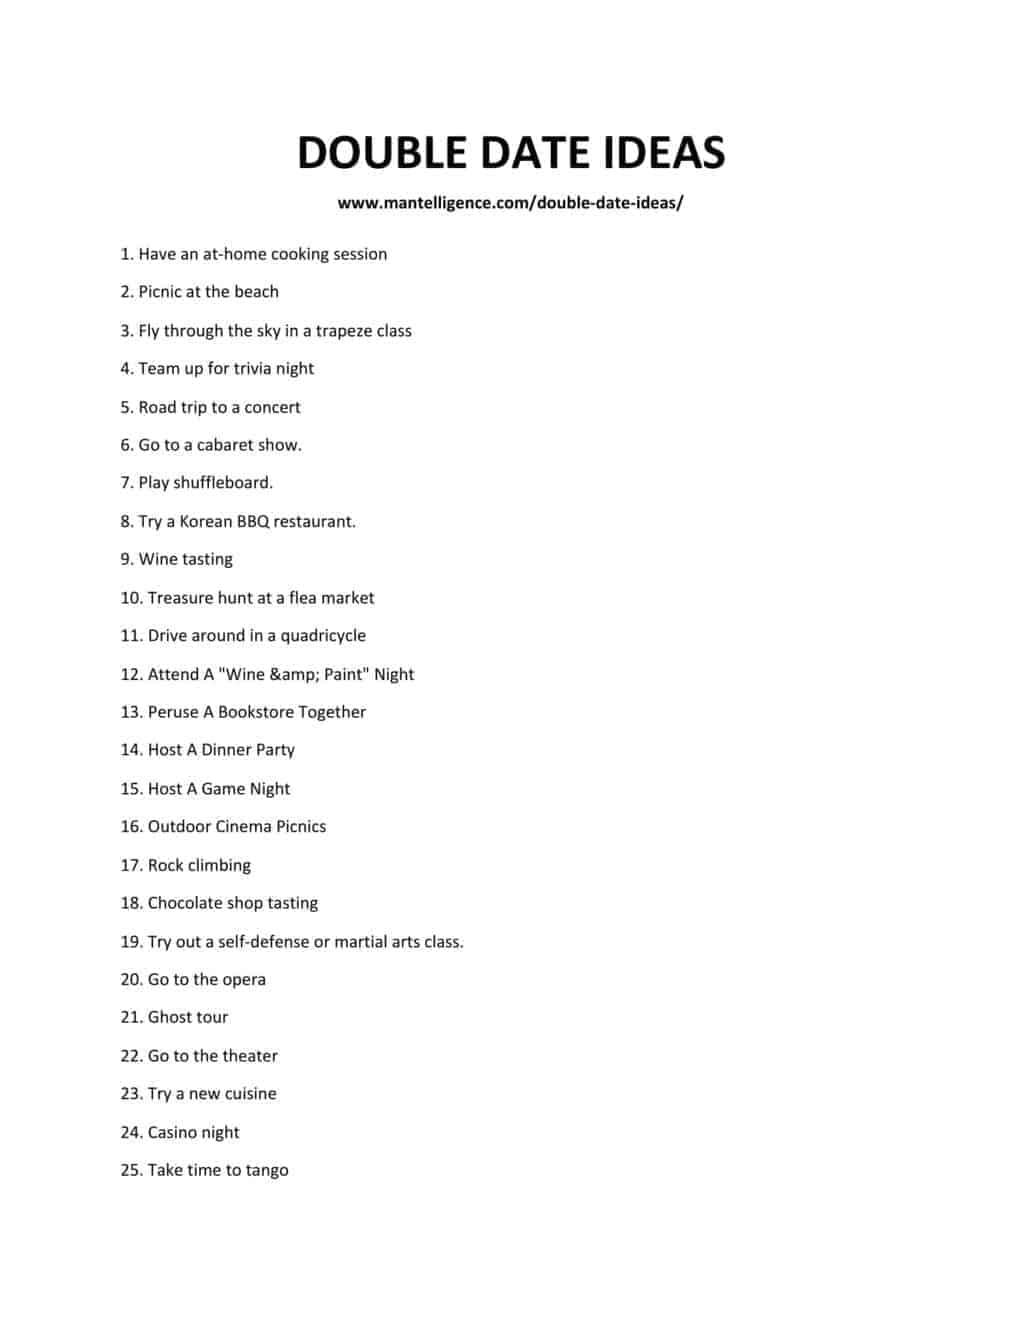 DOUBLE DATE IDEAS-1